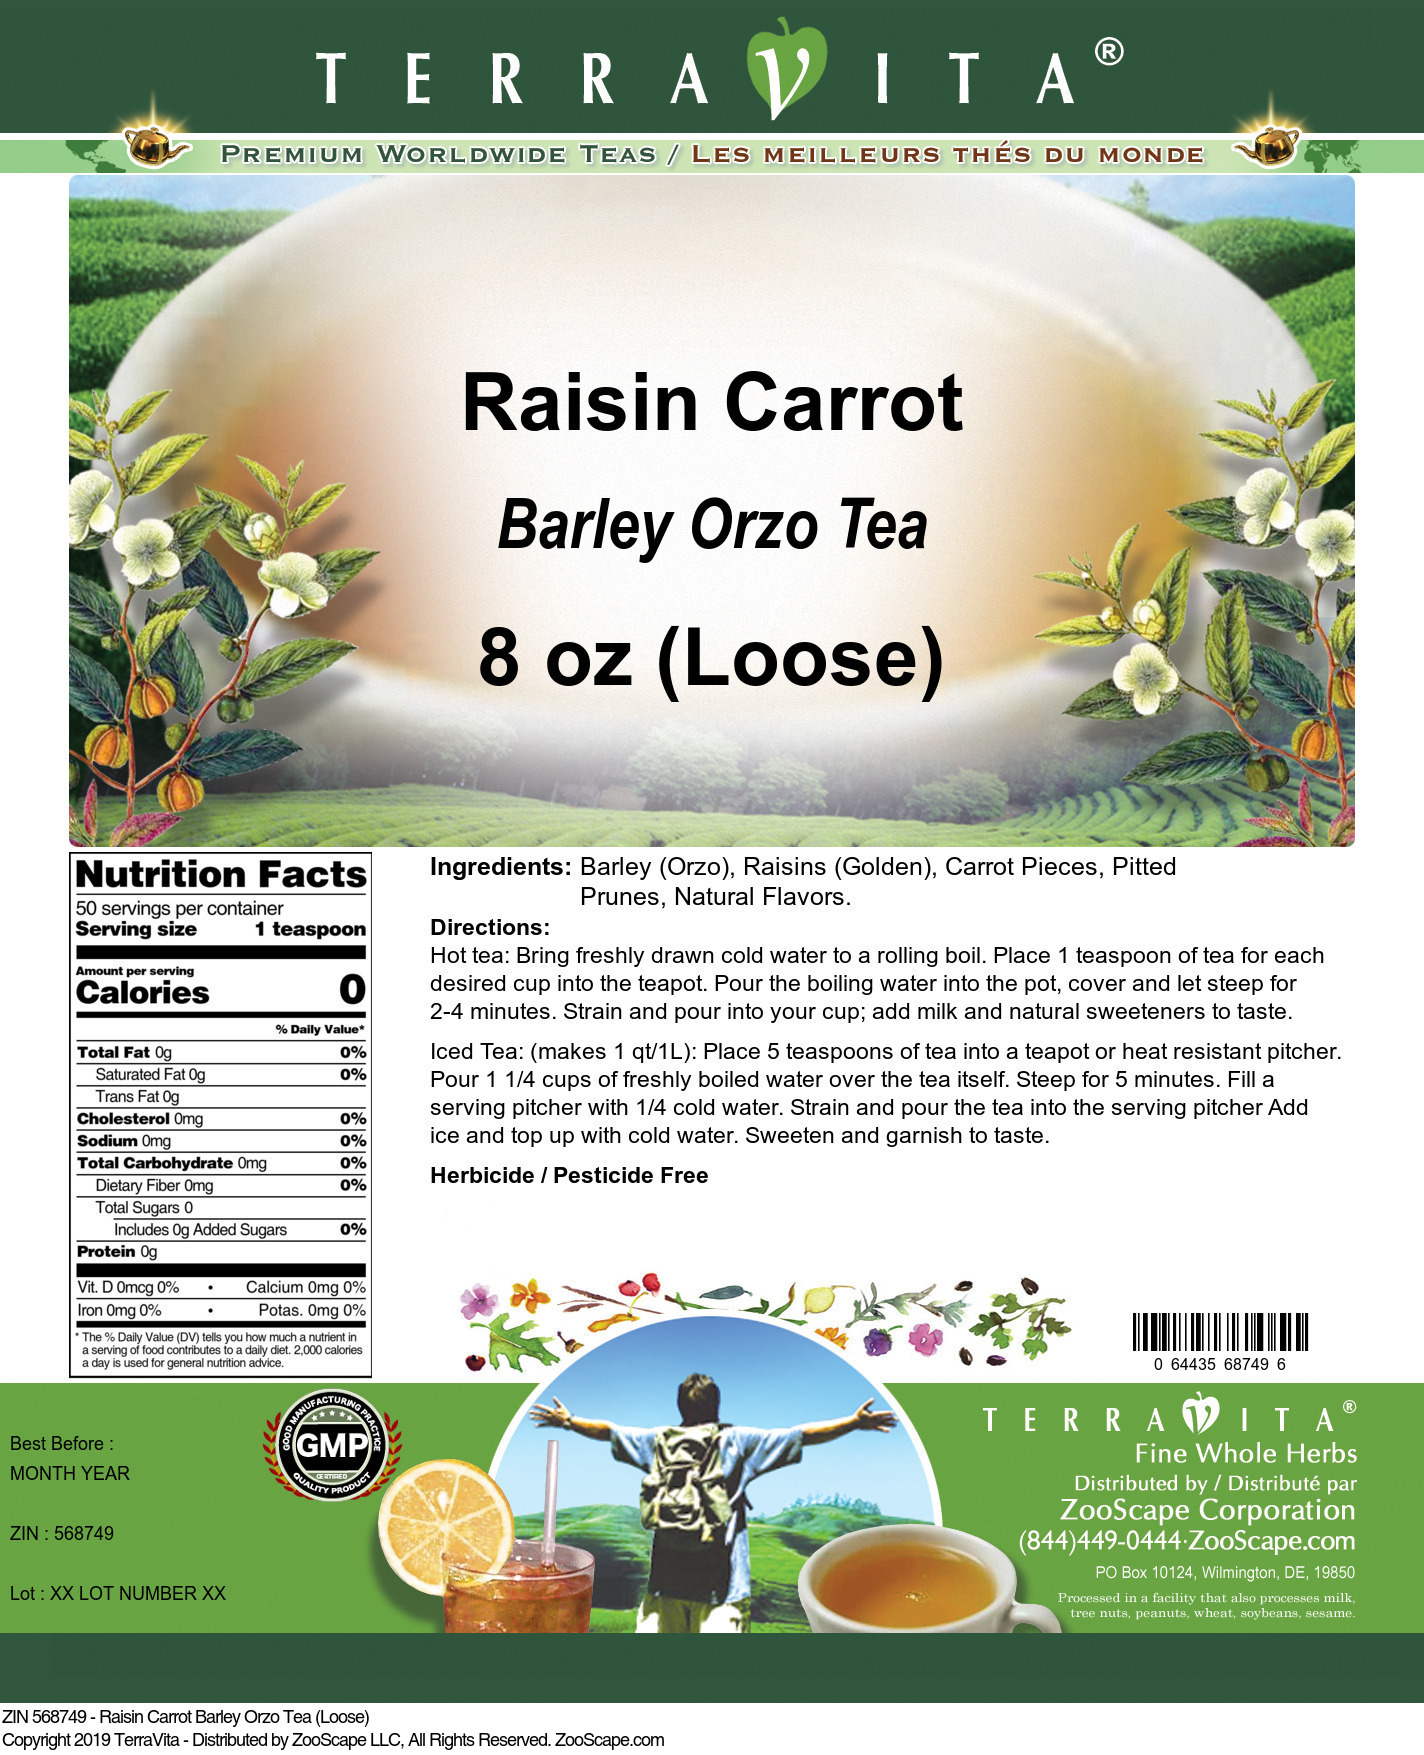 Raisin Carrot Barley Orzo Tea (Loose)